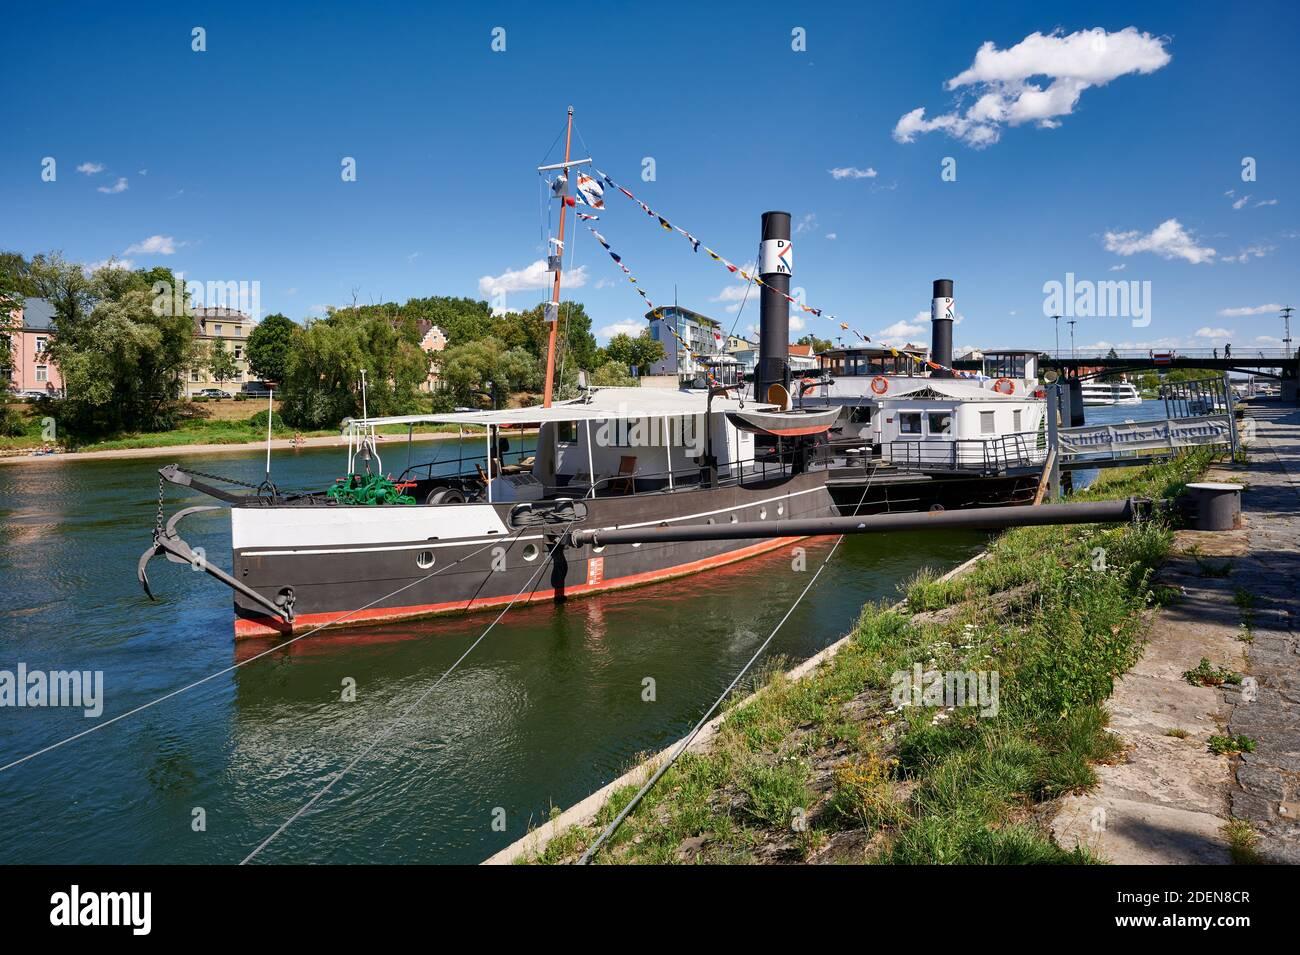 Museumsschiff RUTHOF / ÉRSEKCSANÁD Ship Museum on River Danube, Regensburg , Bavaria, Germany Stock Photo